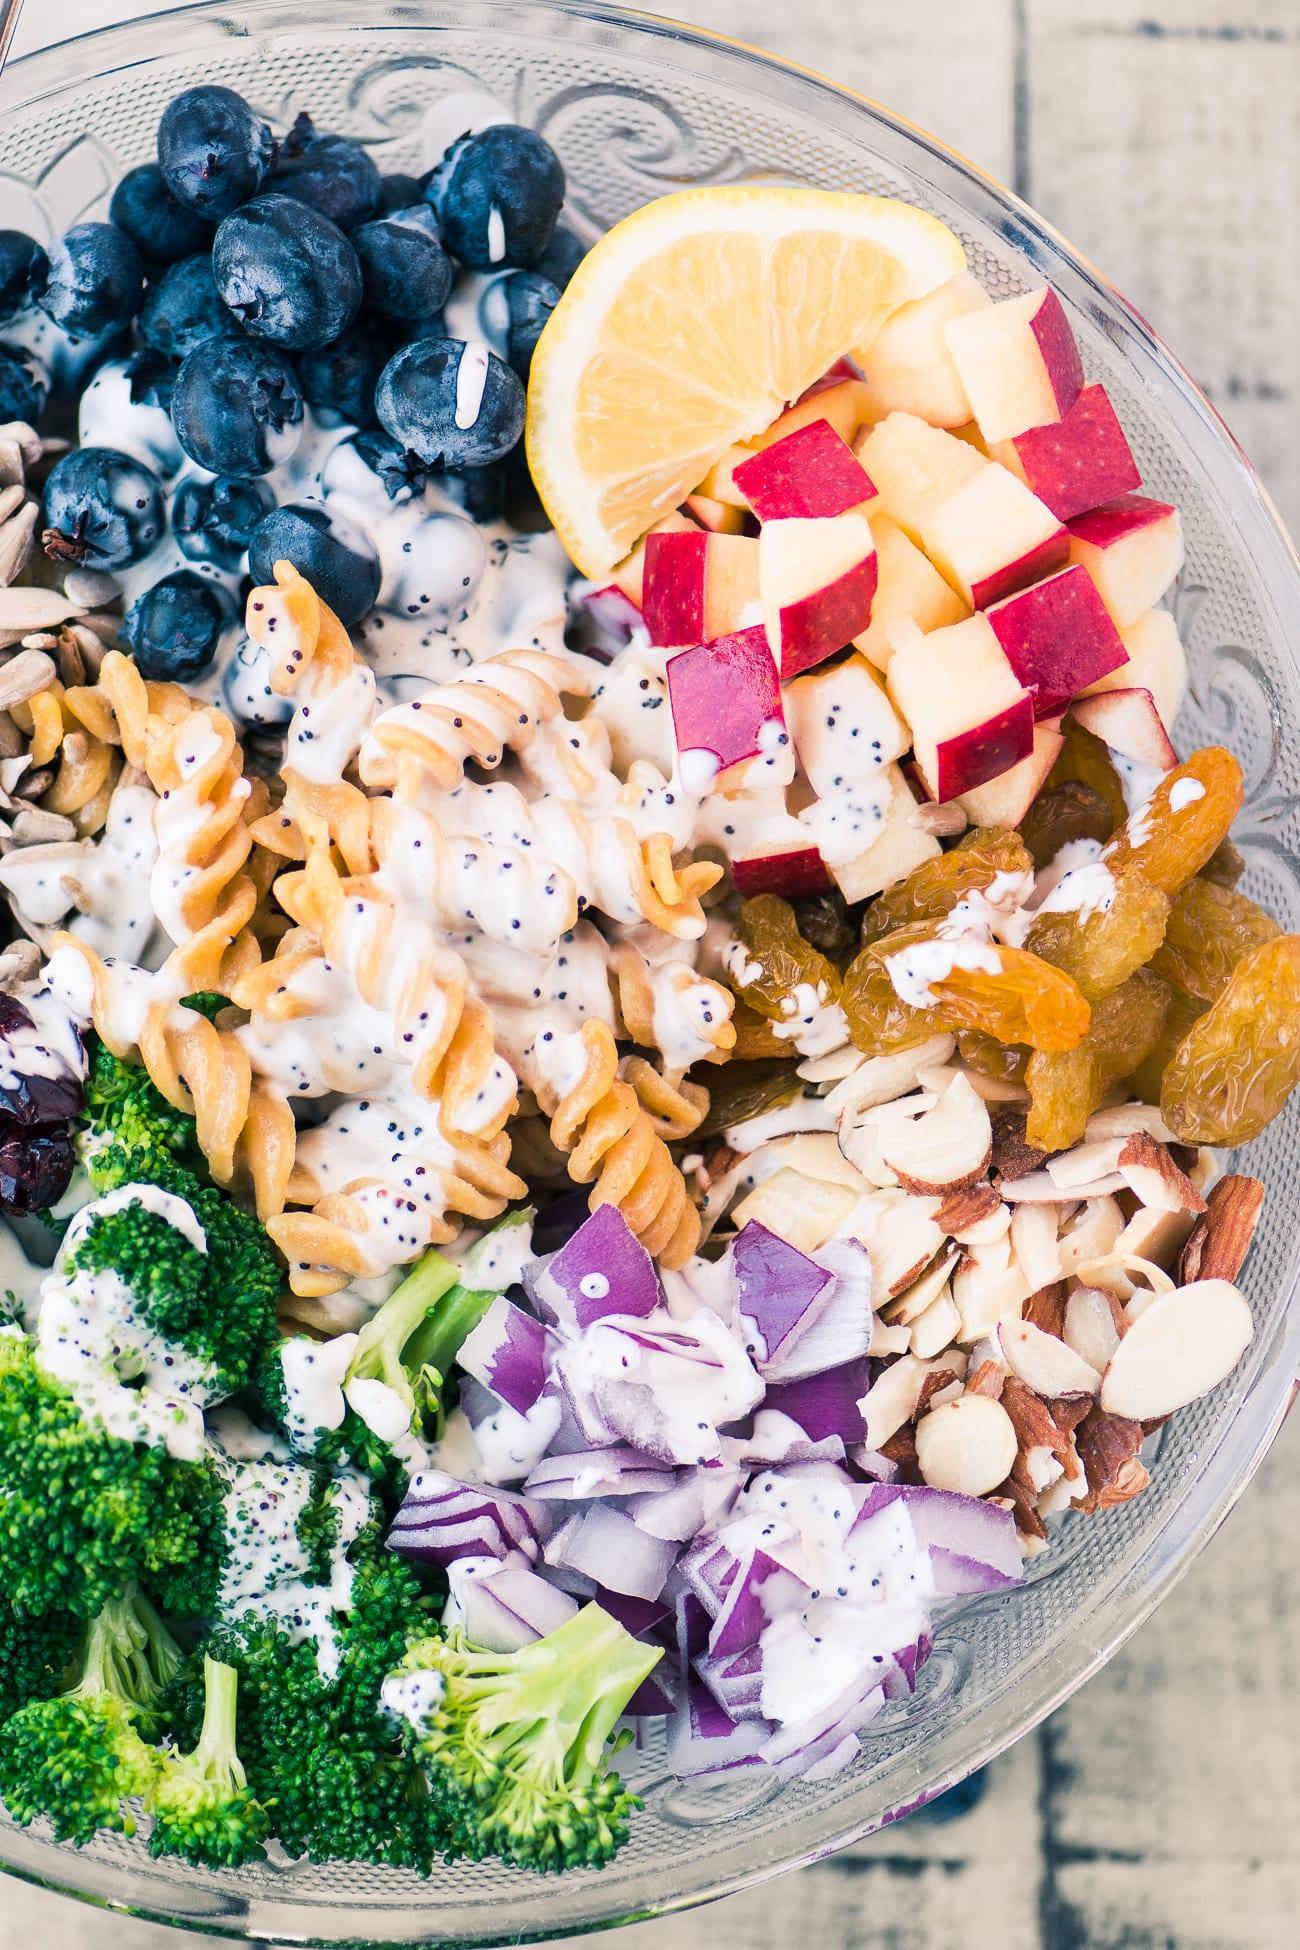 Broccoli and Blueberry Pasta Salad - Chickapea Pasta